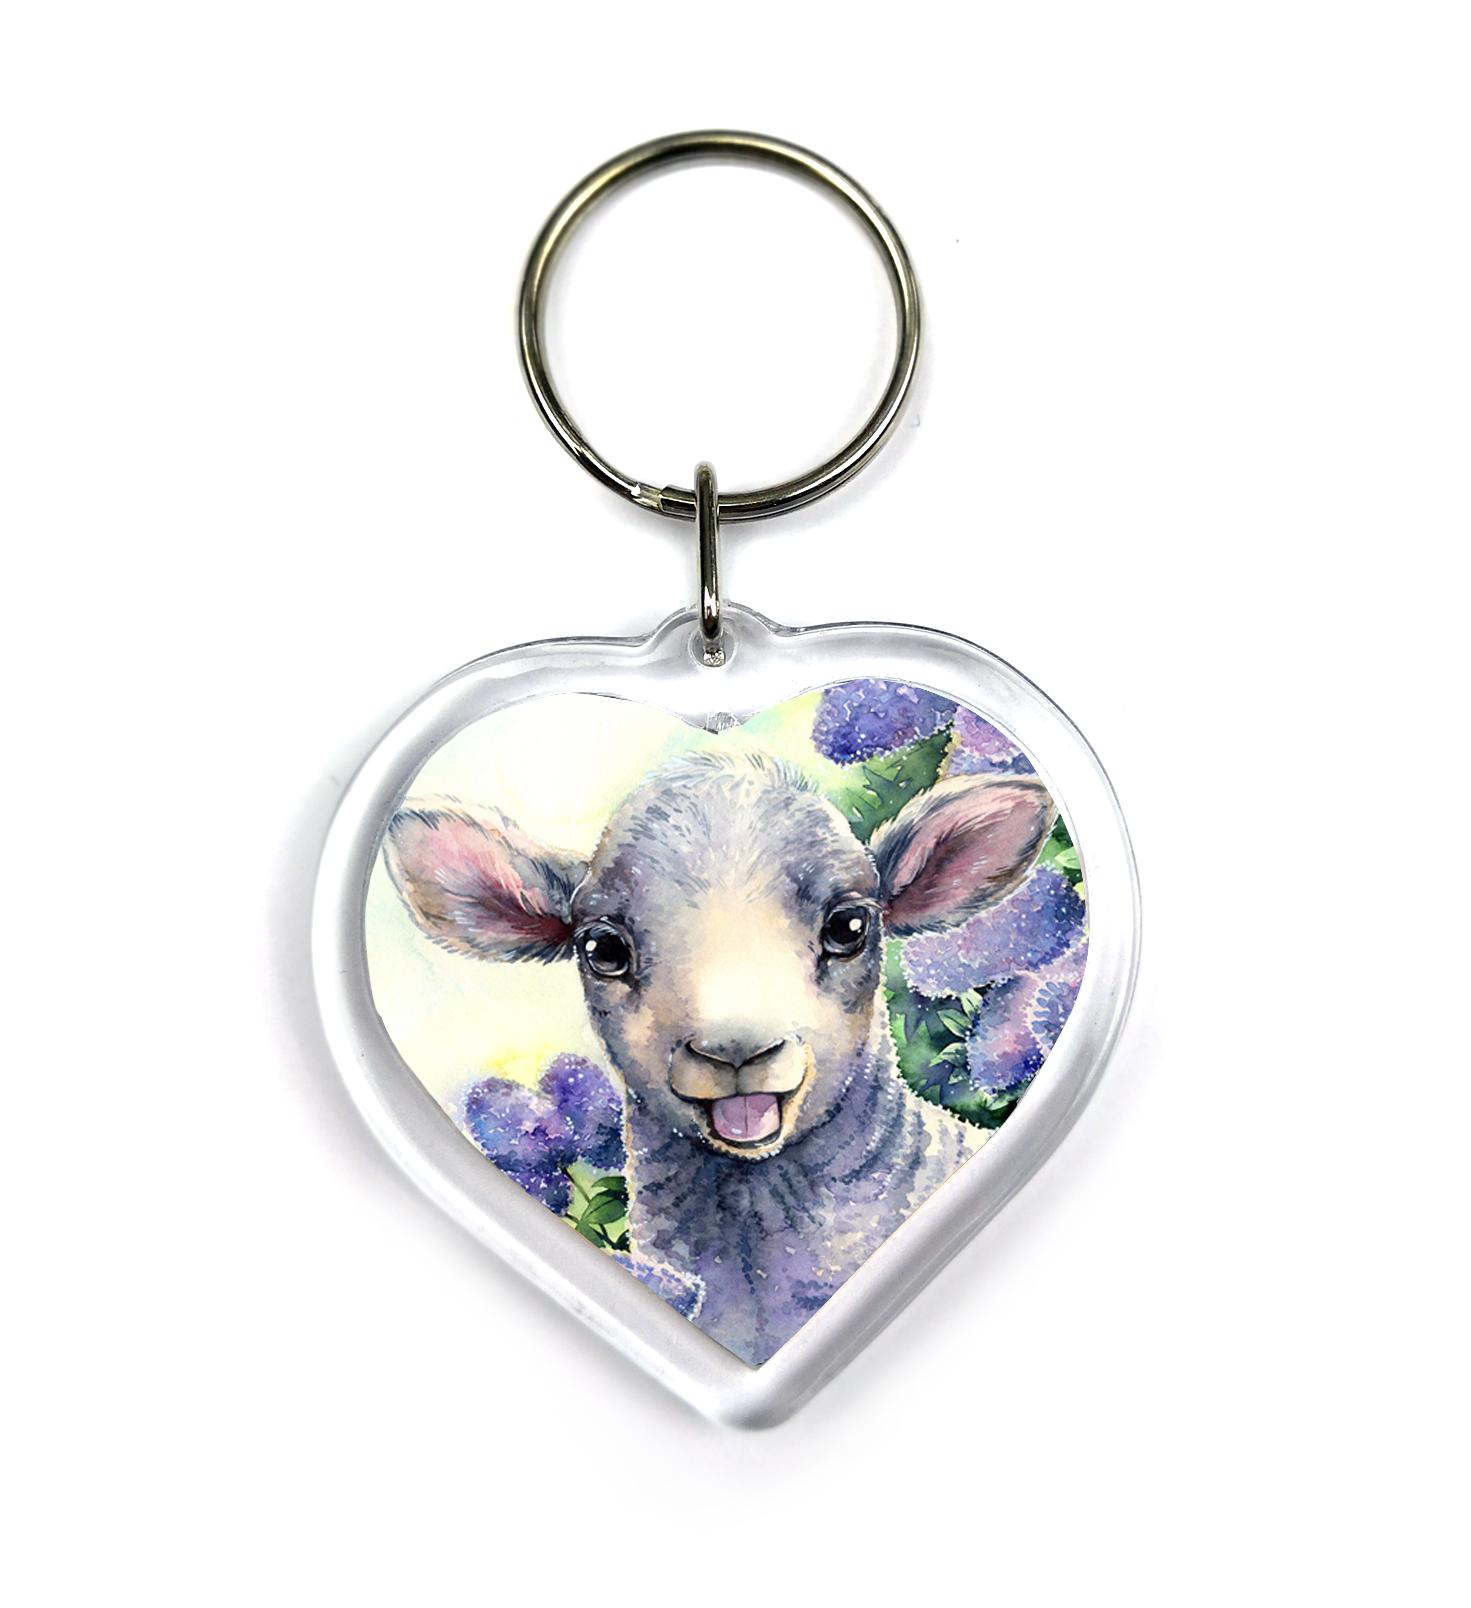 Keychain - Little Lamb